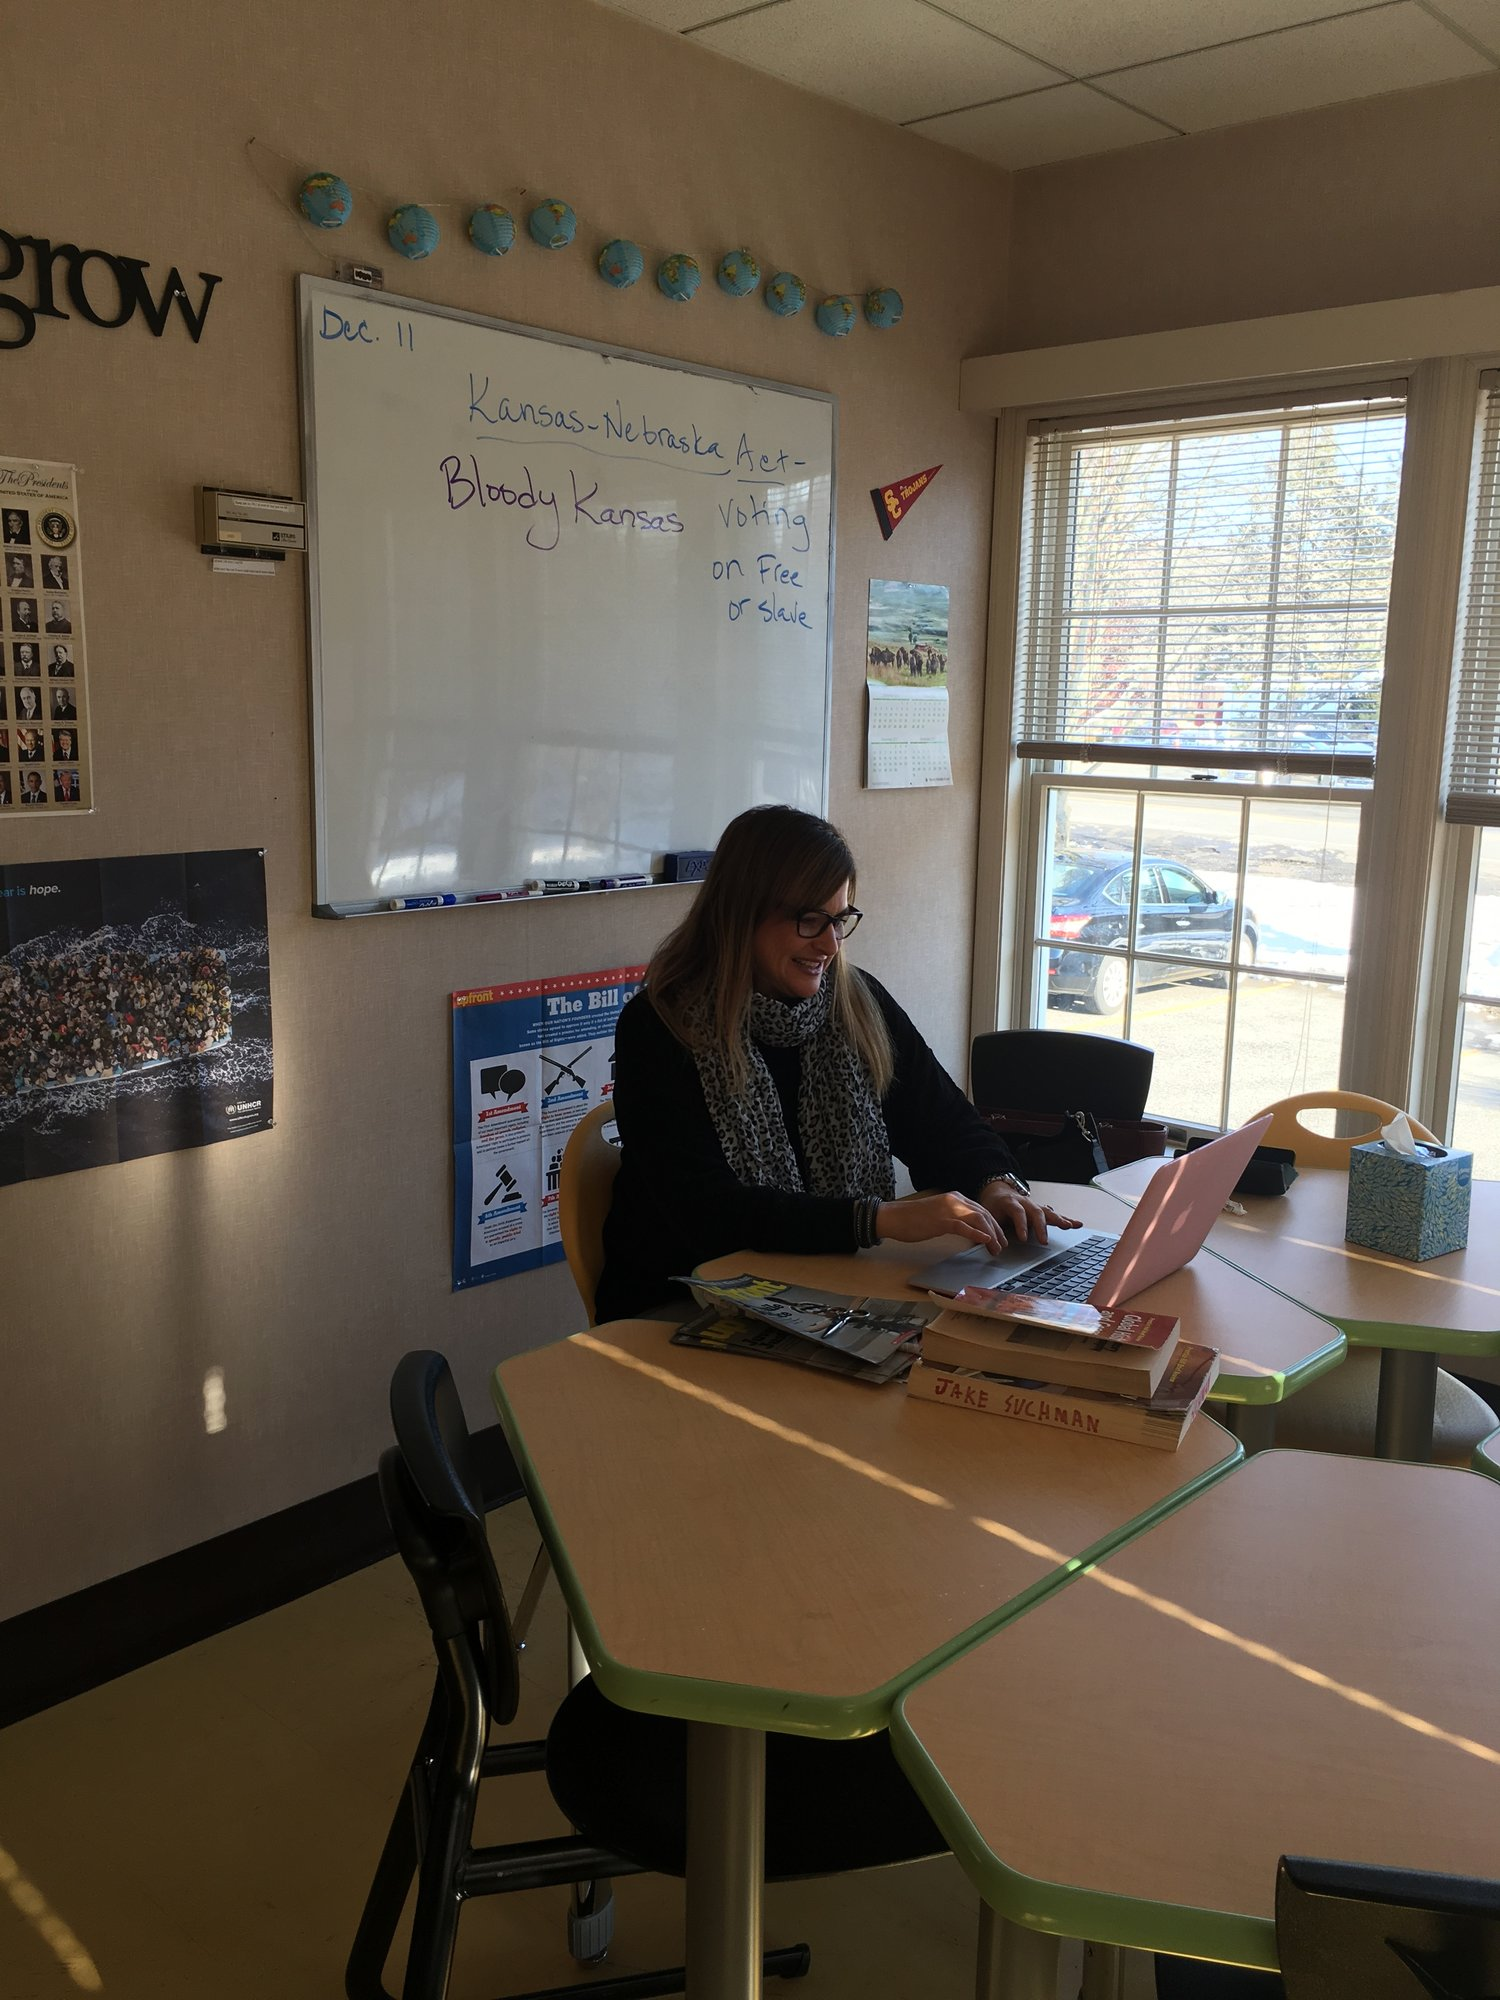 Julie Suchman, History teacher. Photo by Ilene B. Miller